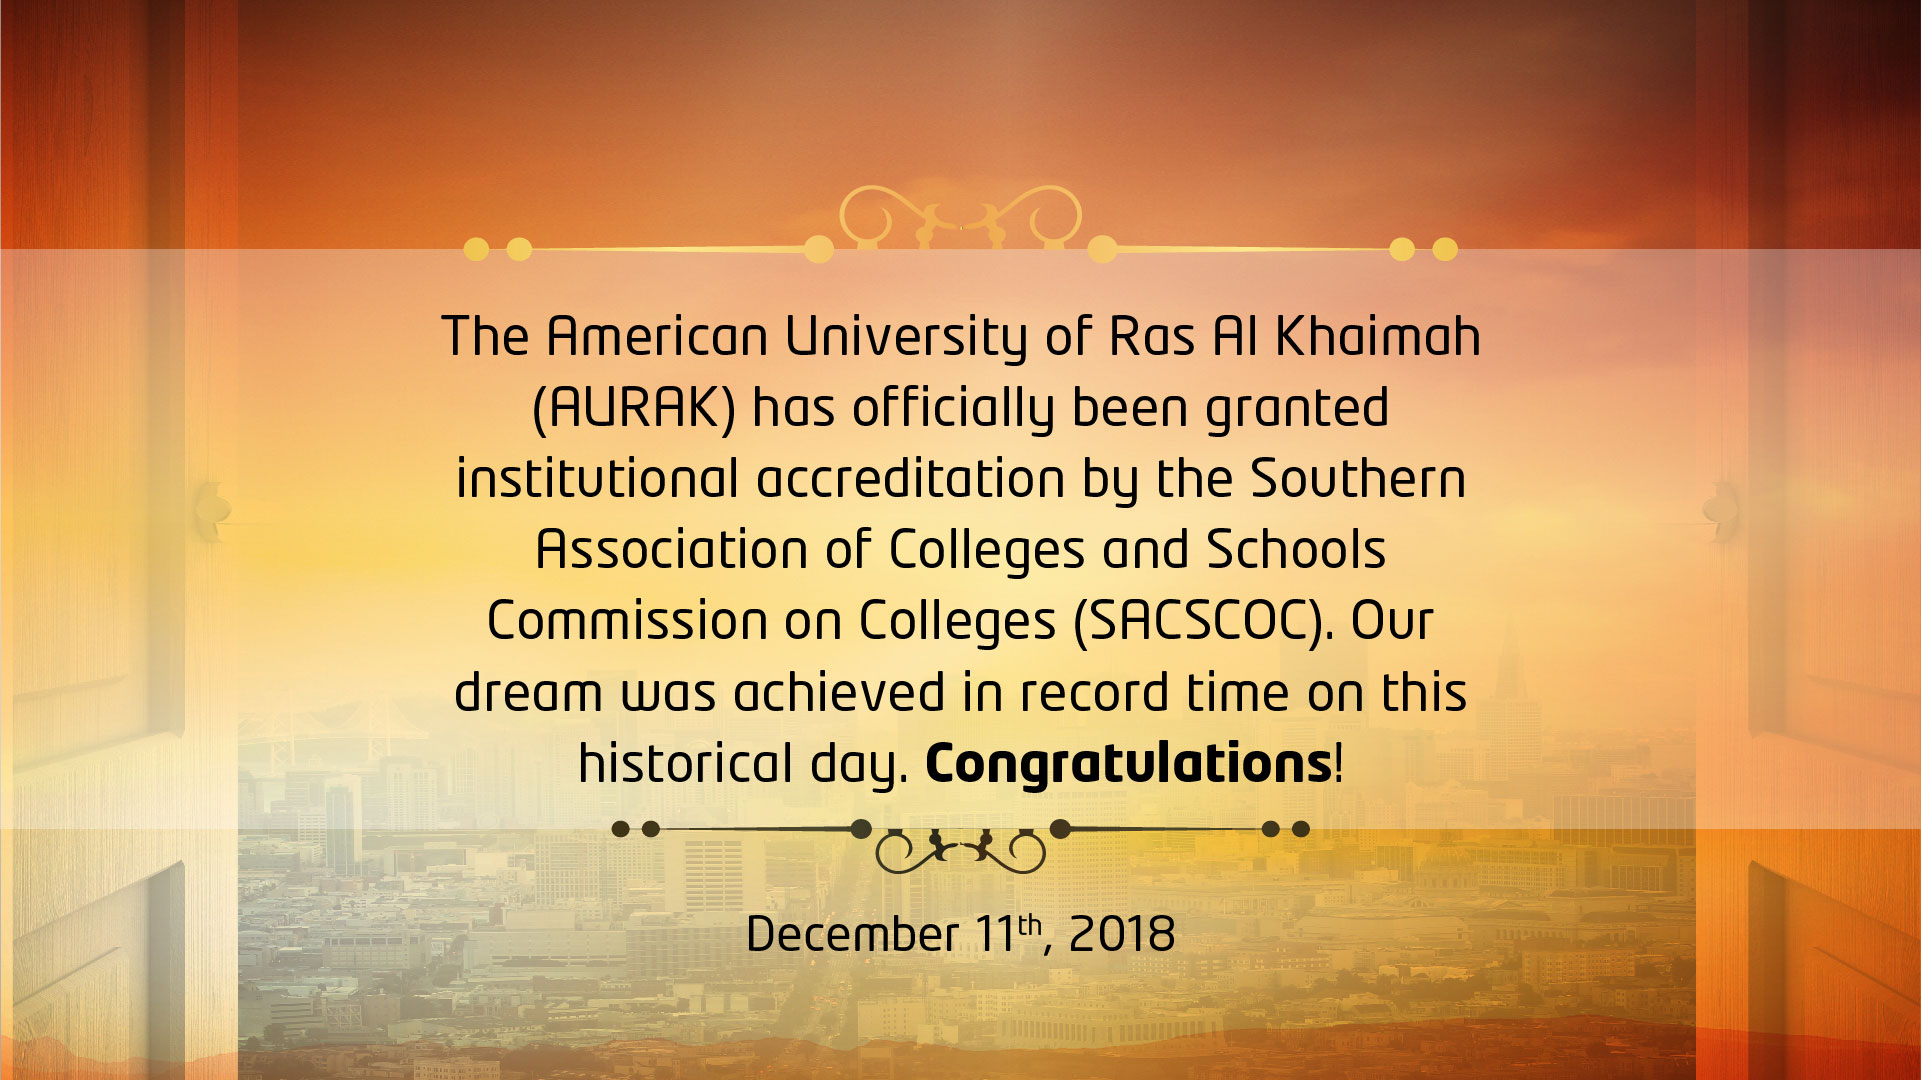 American University of Ras Al Khaimah - (AURAK)